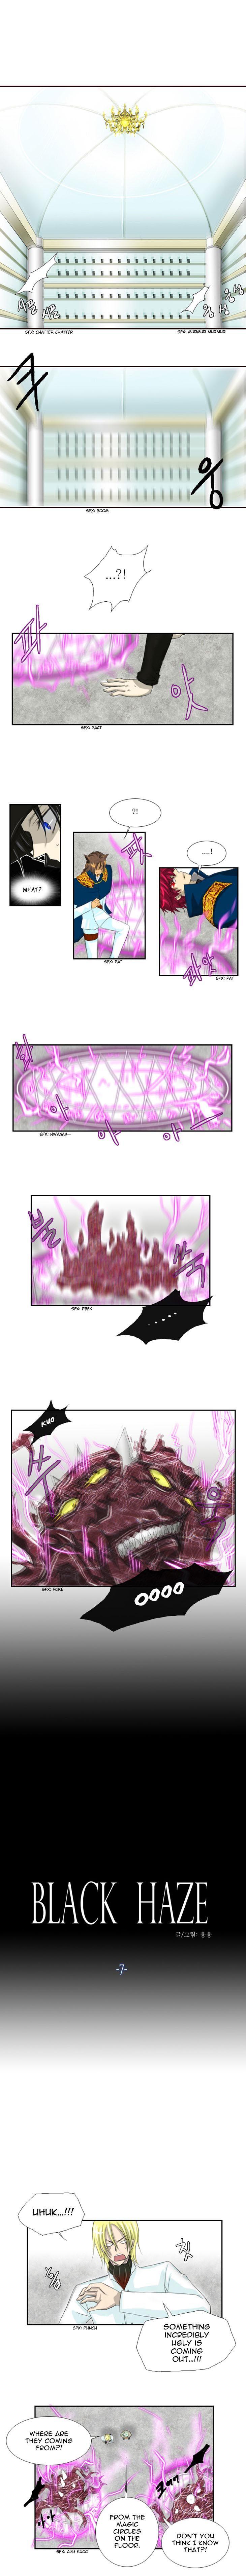 Black Haze 7 Page 1